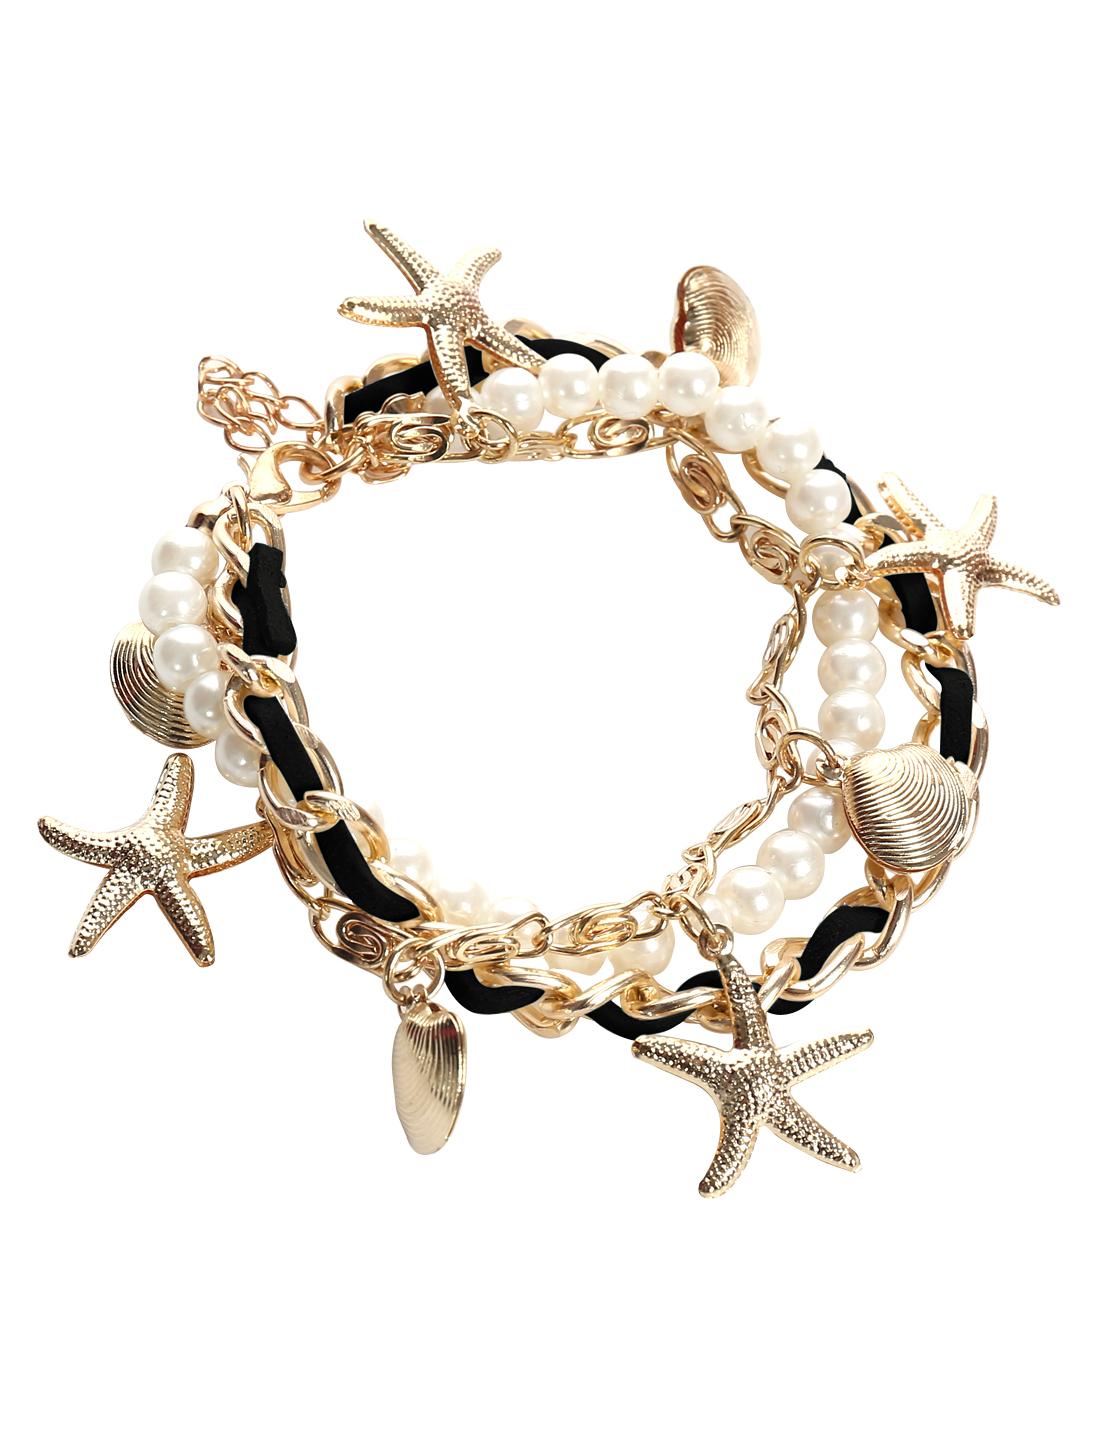 Starfish Shell Rose Black Leather Imitation Pearl Charm Wrap Wristband Bracelet Bangle Chain Cuff